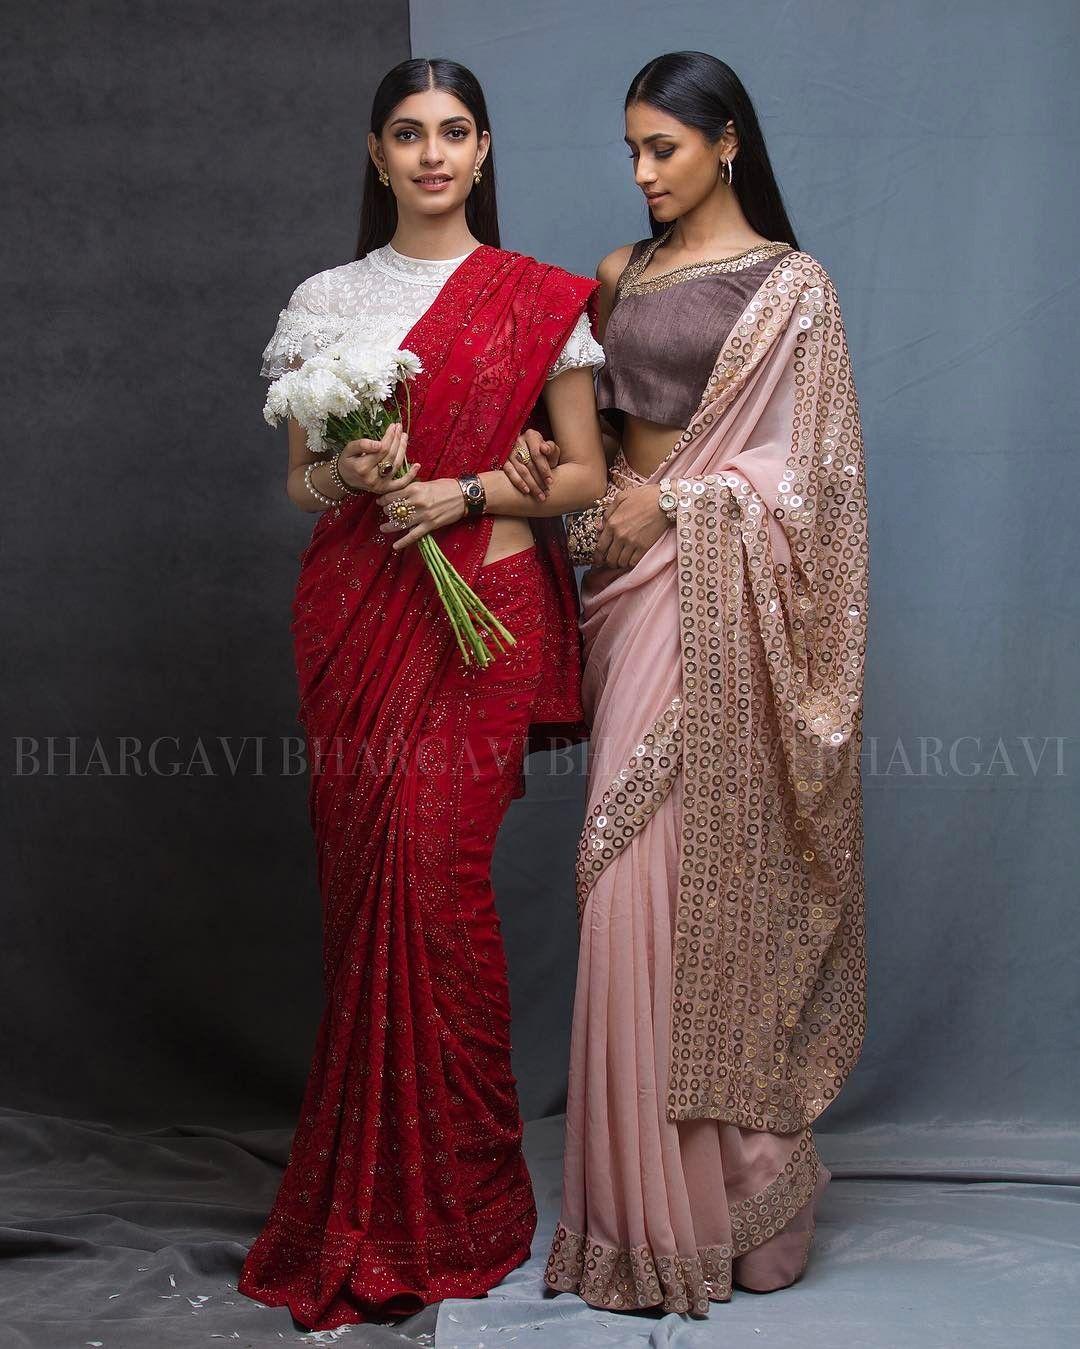 11 Designer Saree Ideas To Pick For Wedding Reception Parties Keep Me Stylish Saree Designs Saree Trends Indian Dresses